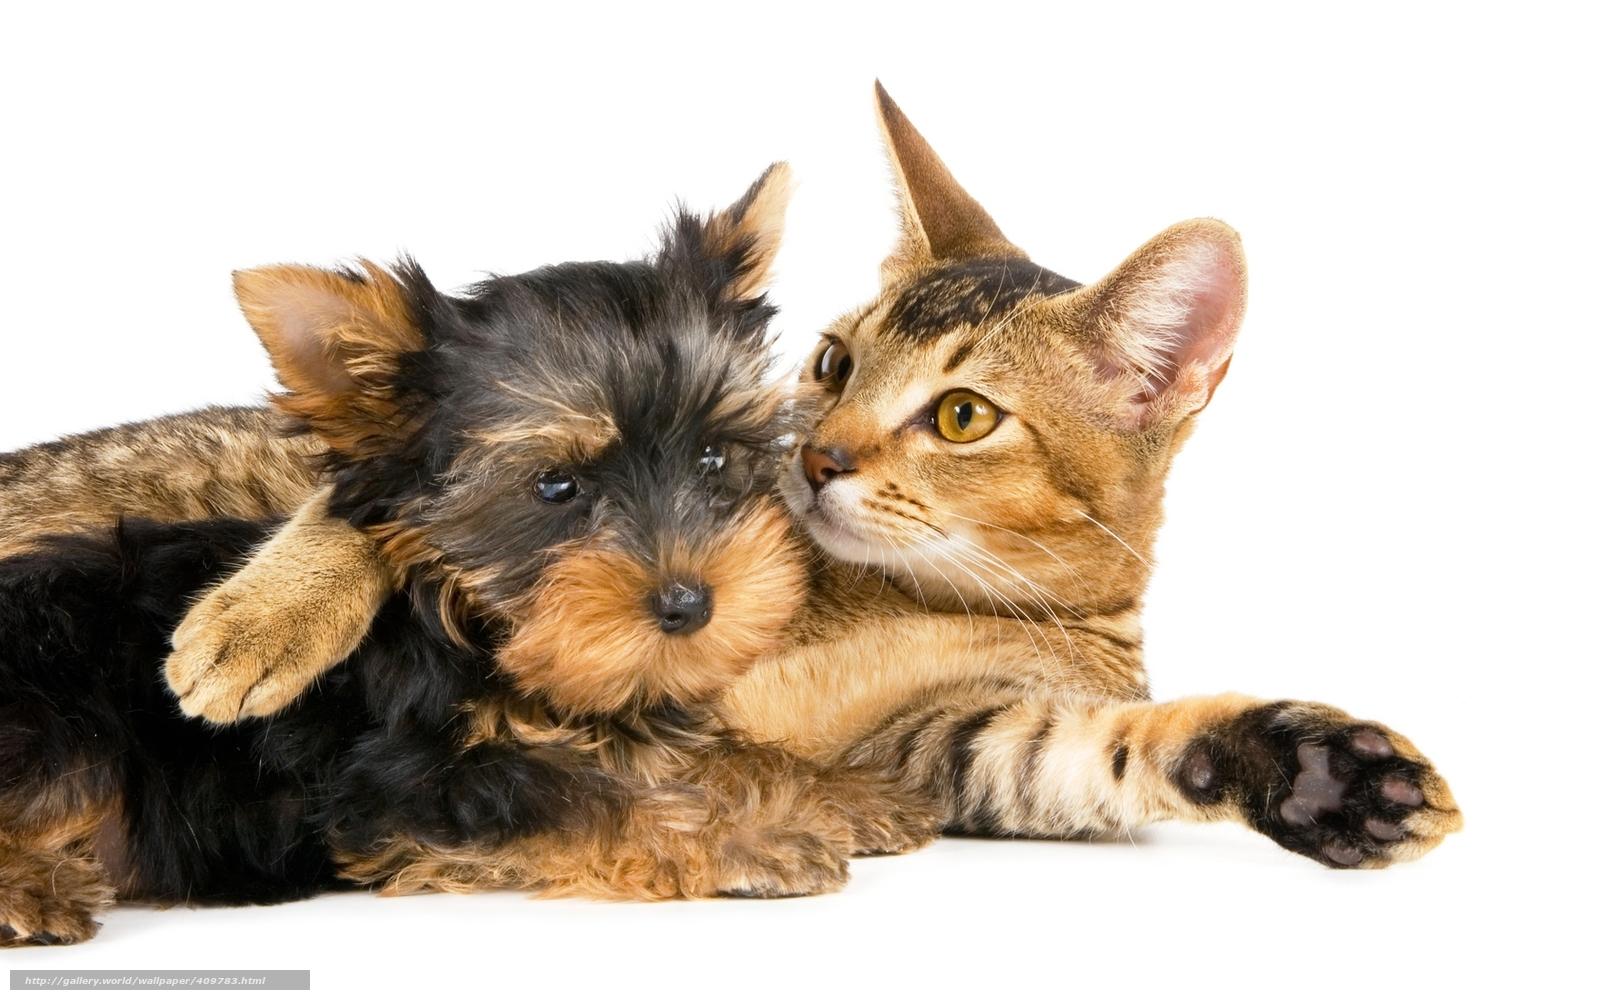 Скачать обои кот кошка собака терьер